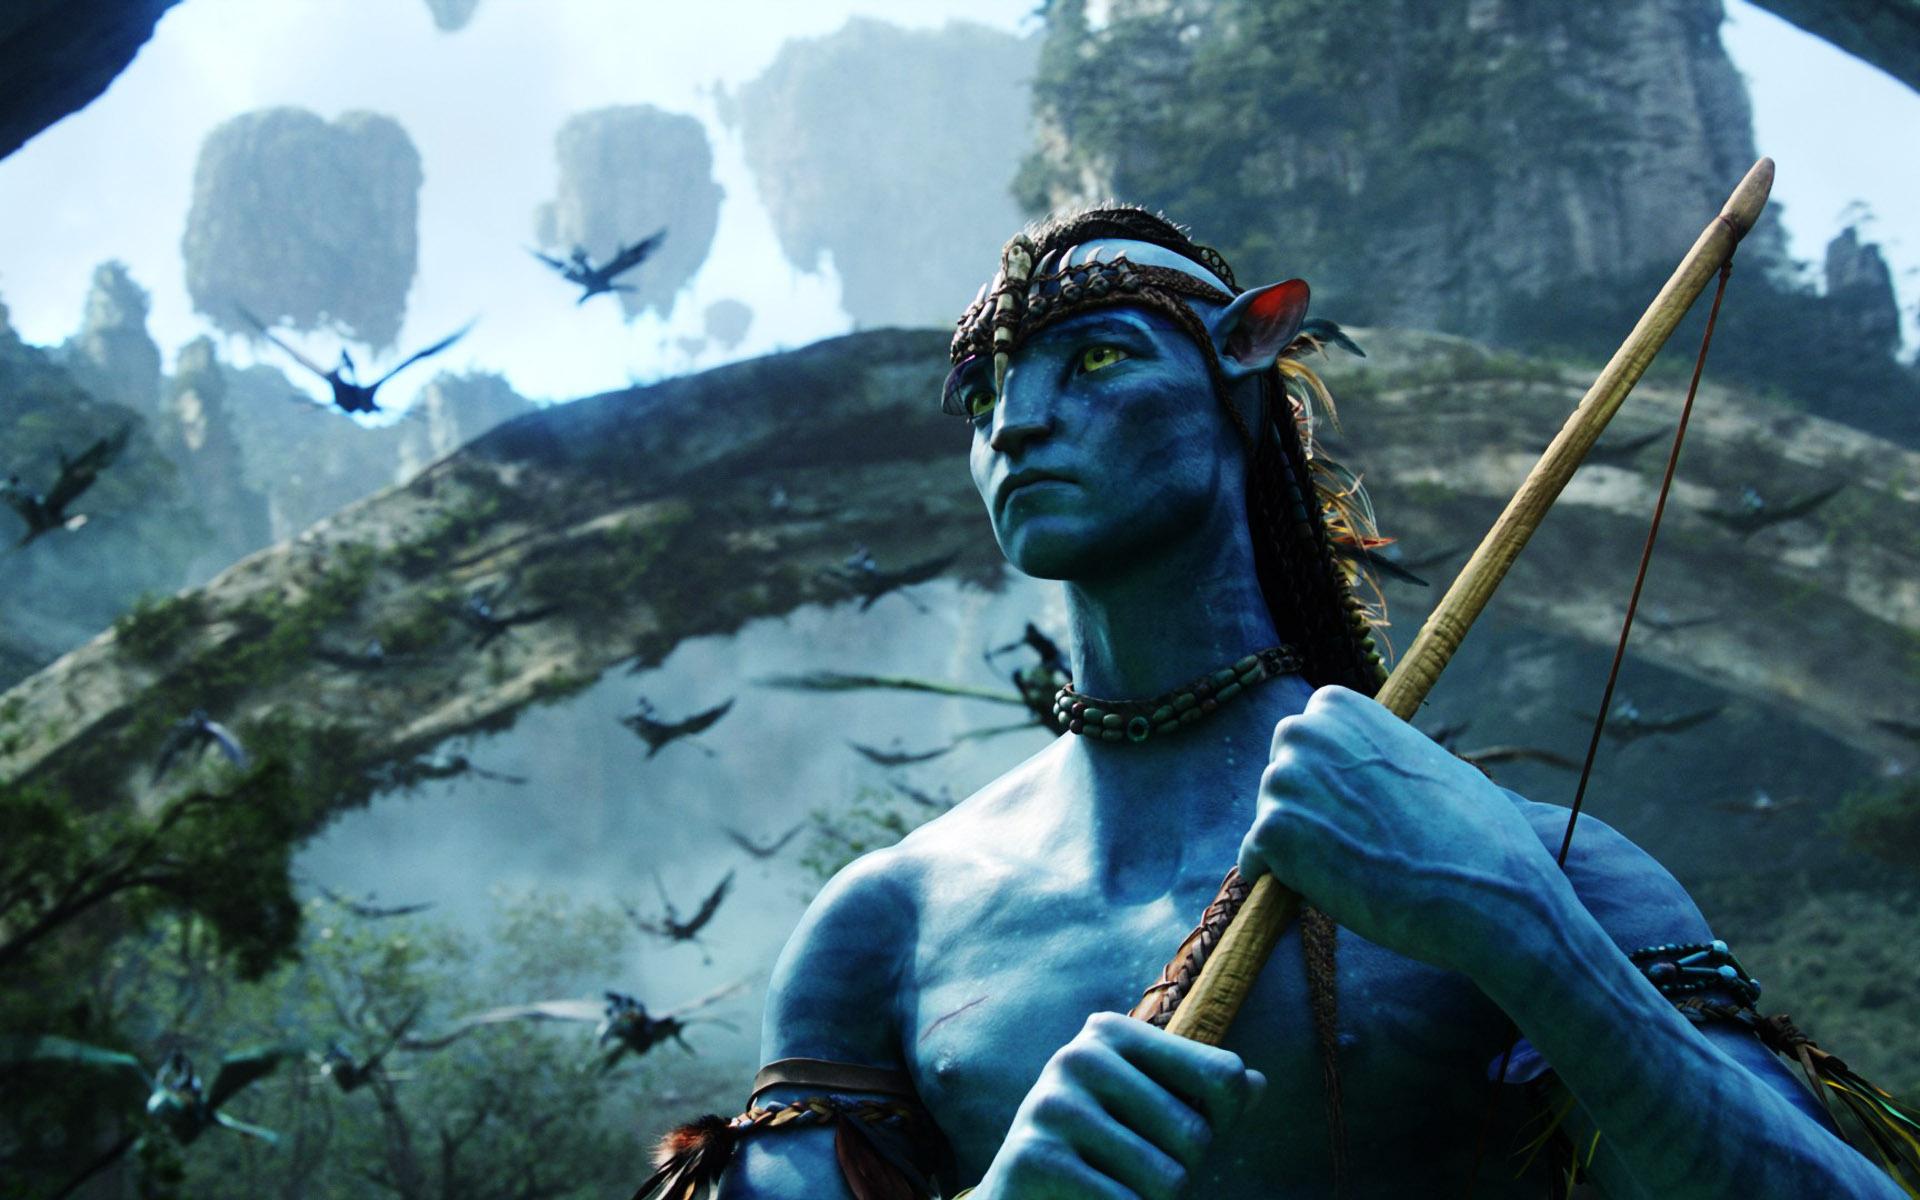 La película Avatar 2 se rodará a 60 cuadros por segundos [Cine]